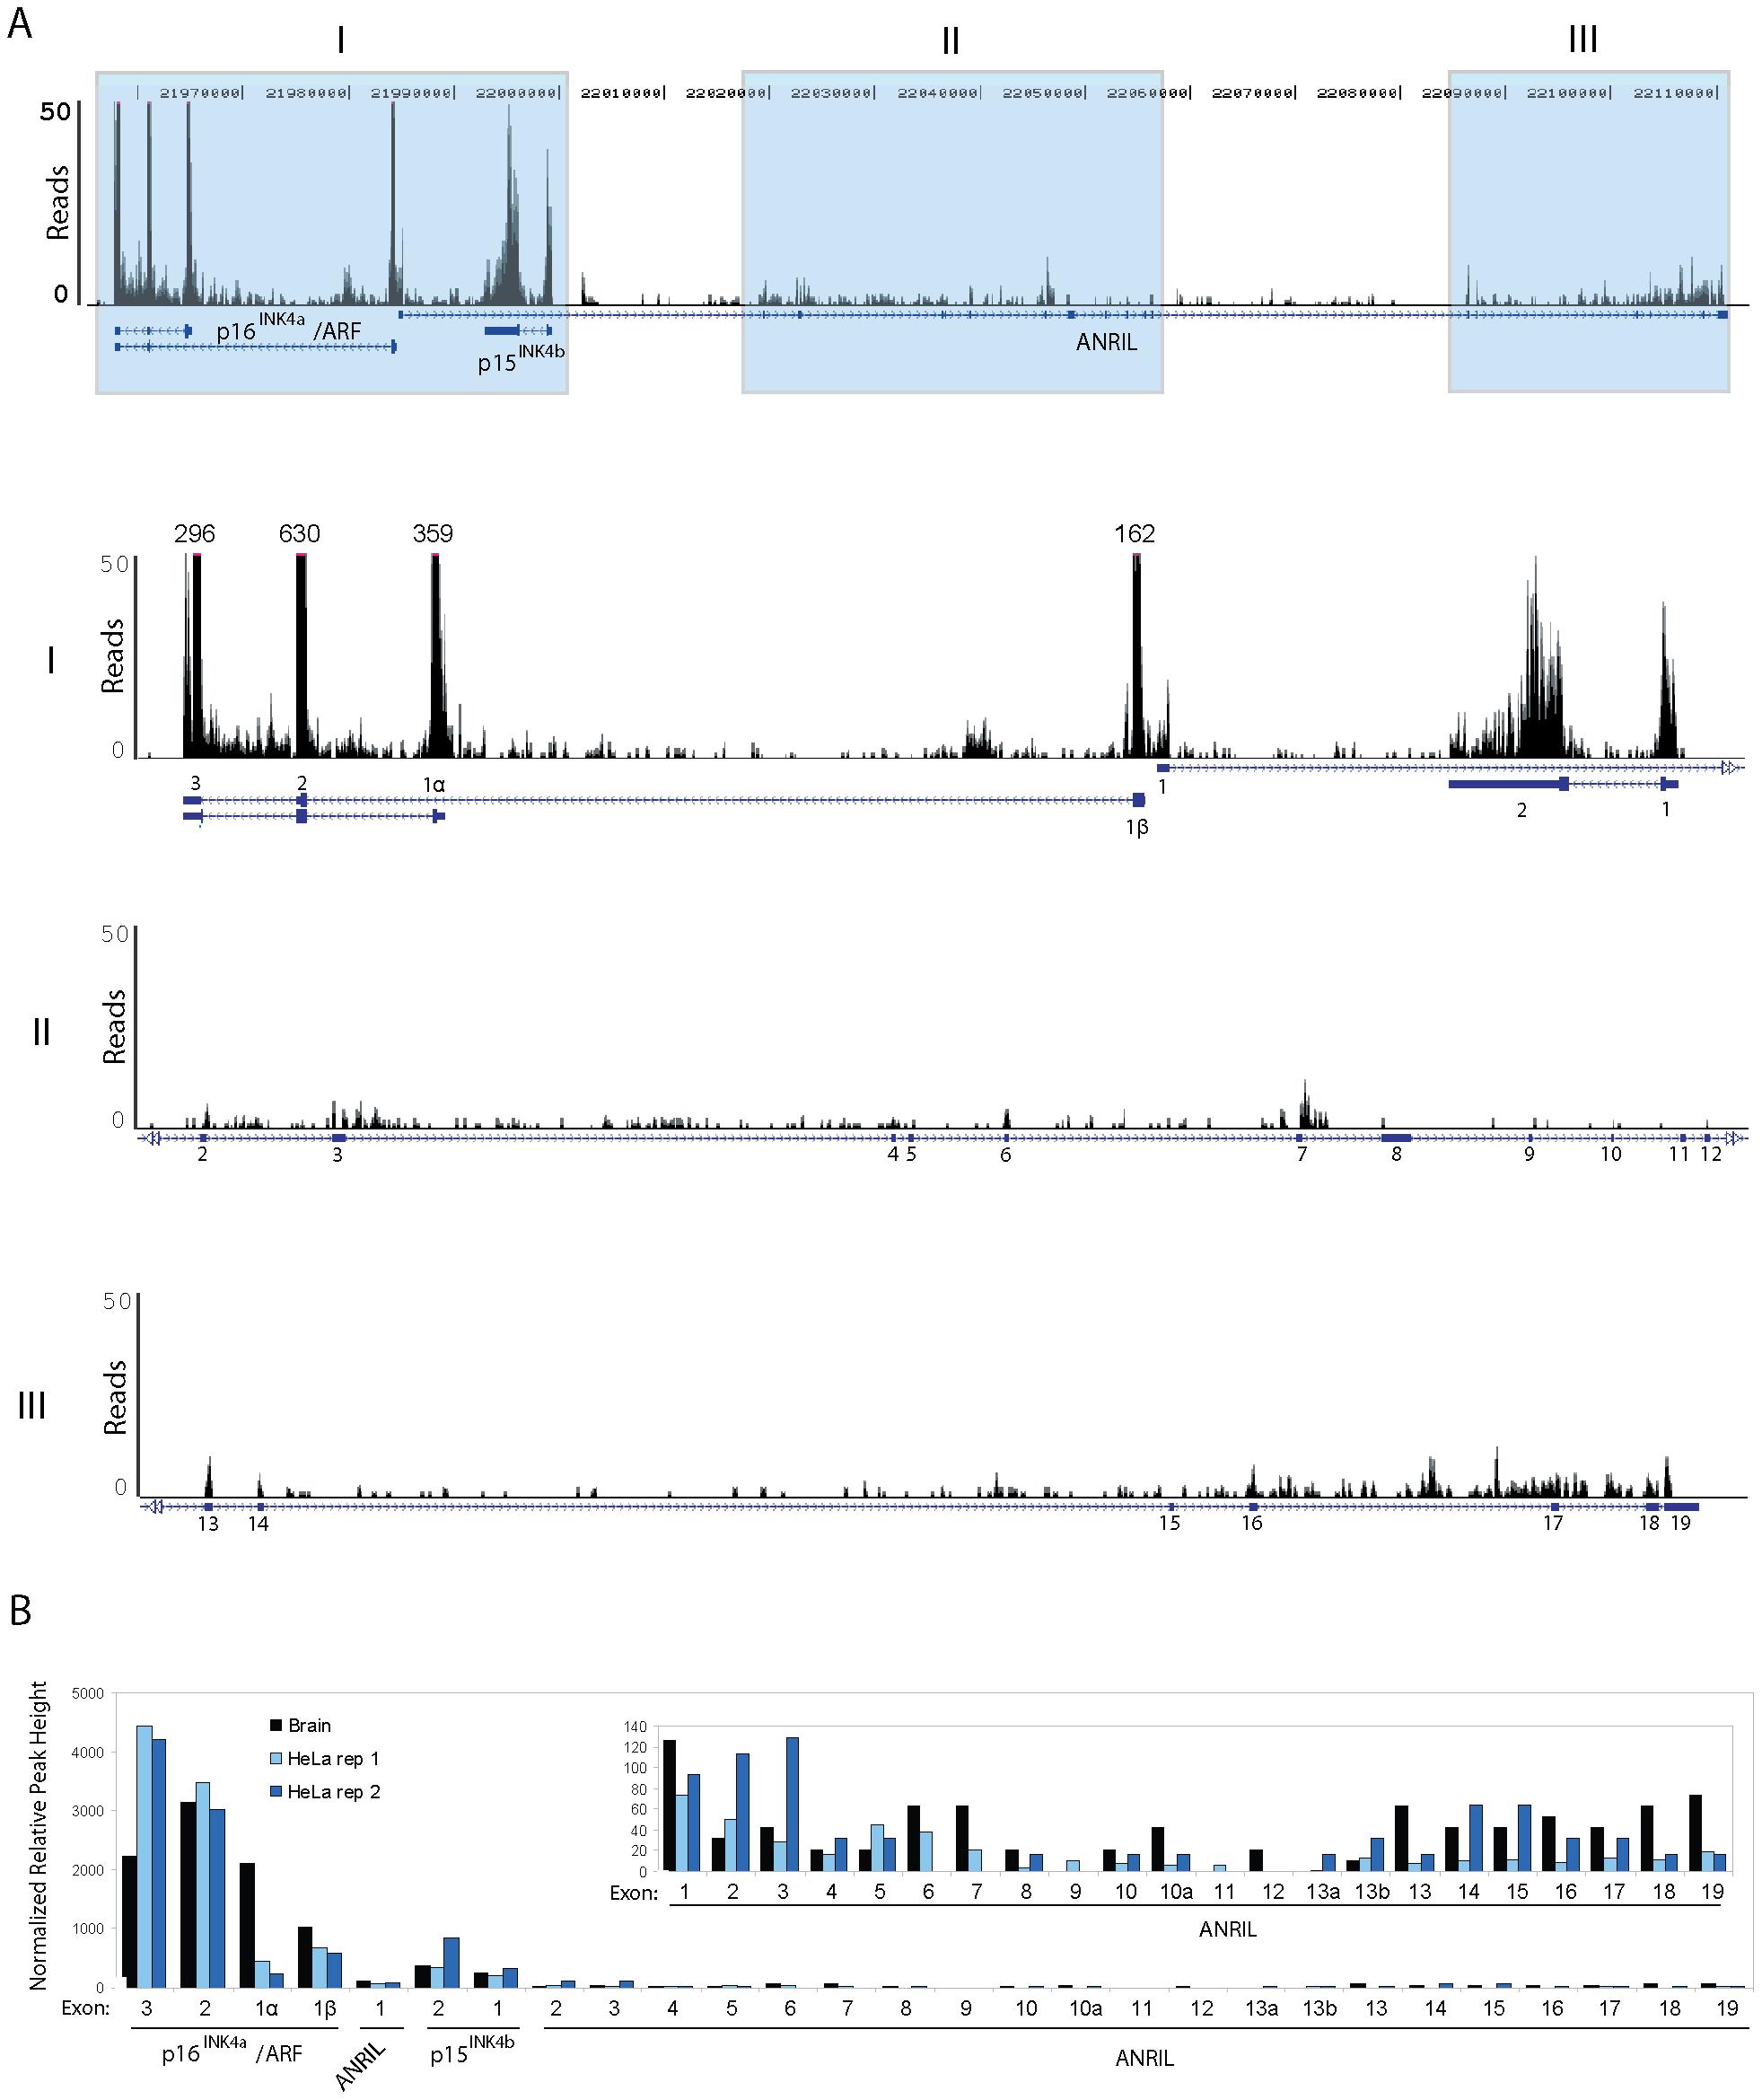 RNA Sequencing of <i>ANRIL</i> transcripts.